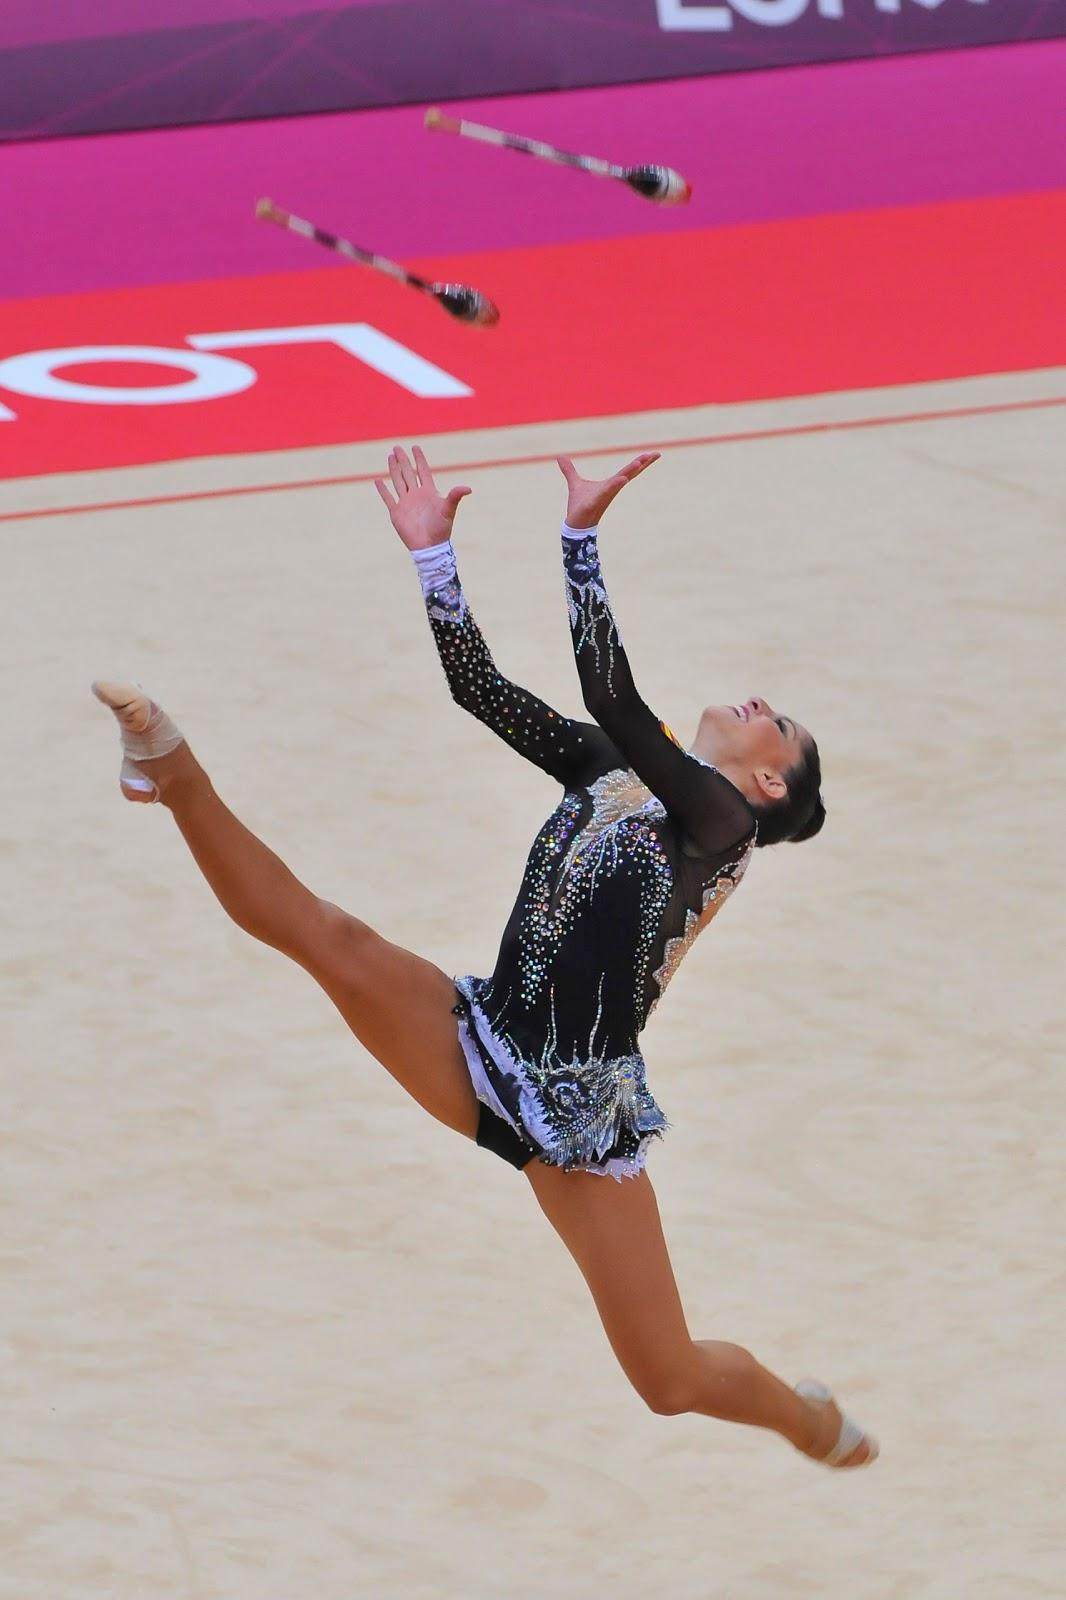 File:Belarus rhythmic gymnastics team 2012 Summer Olympics